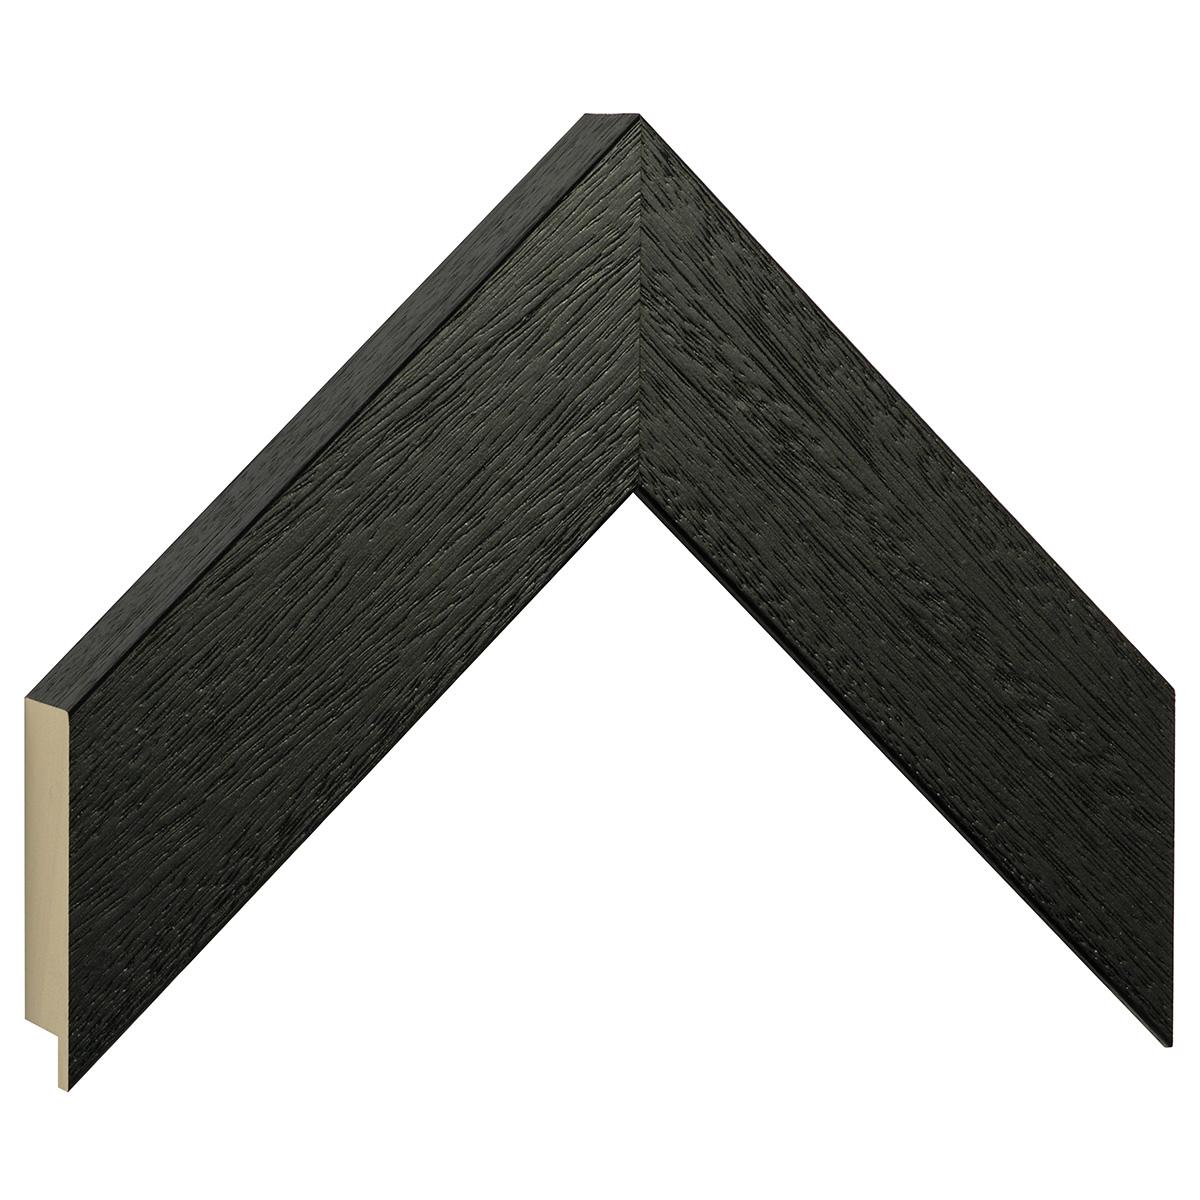 Moulding ayous, width 50mm height 32 - Black, open grain